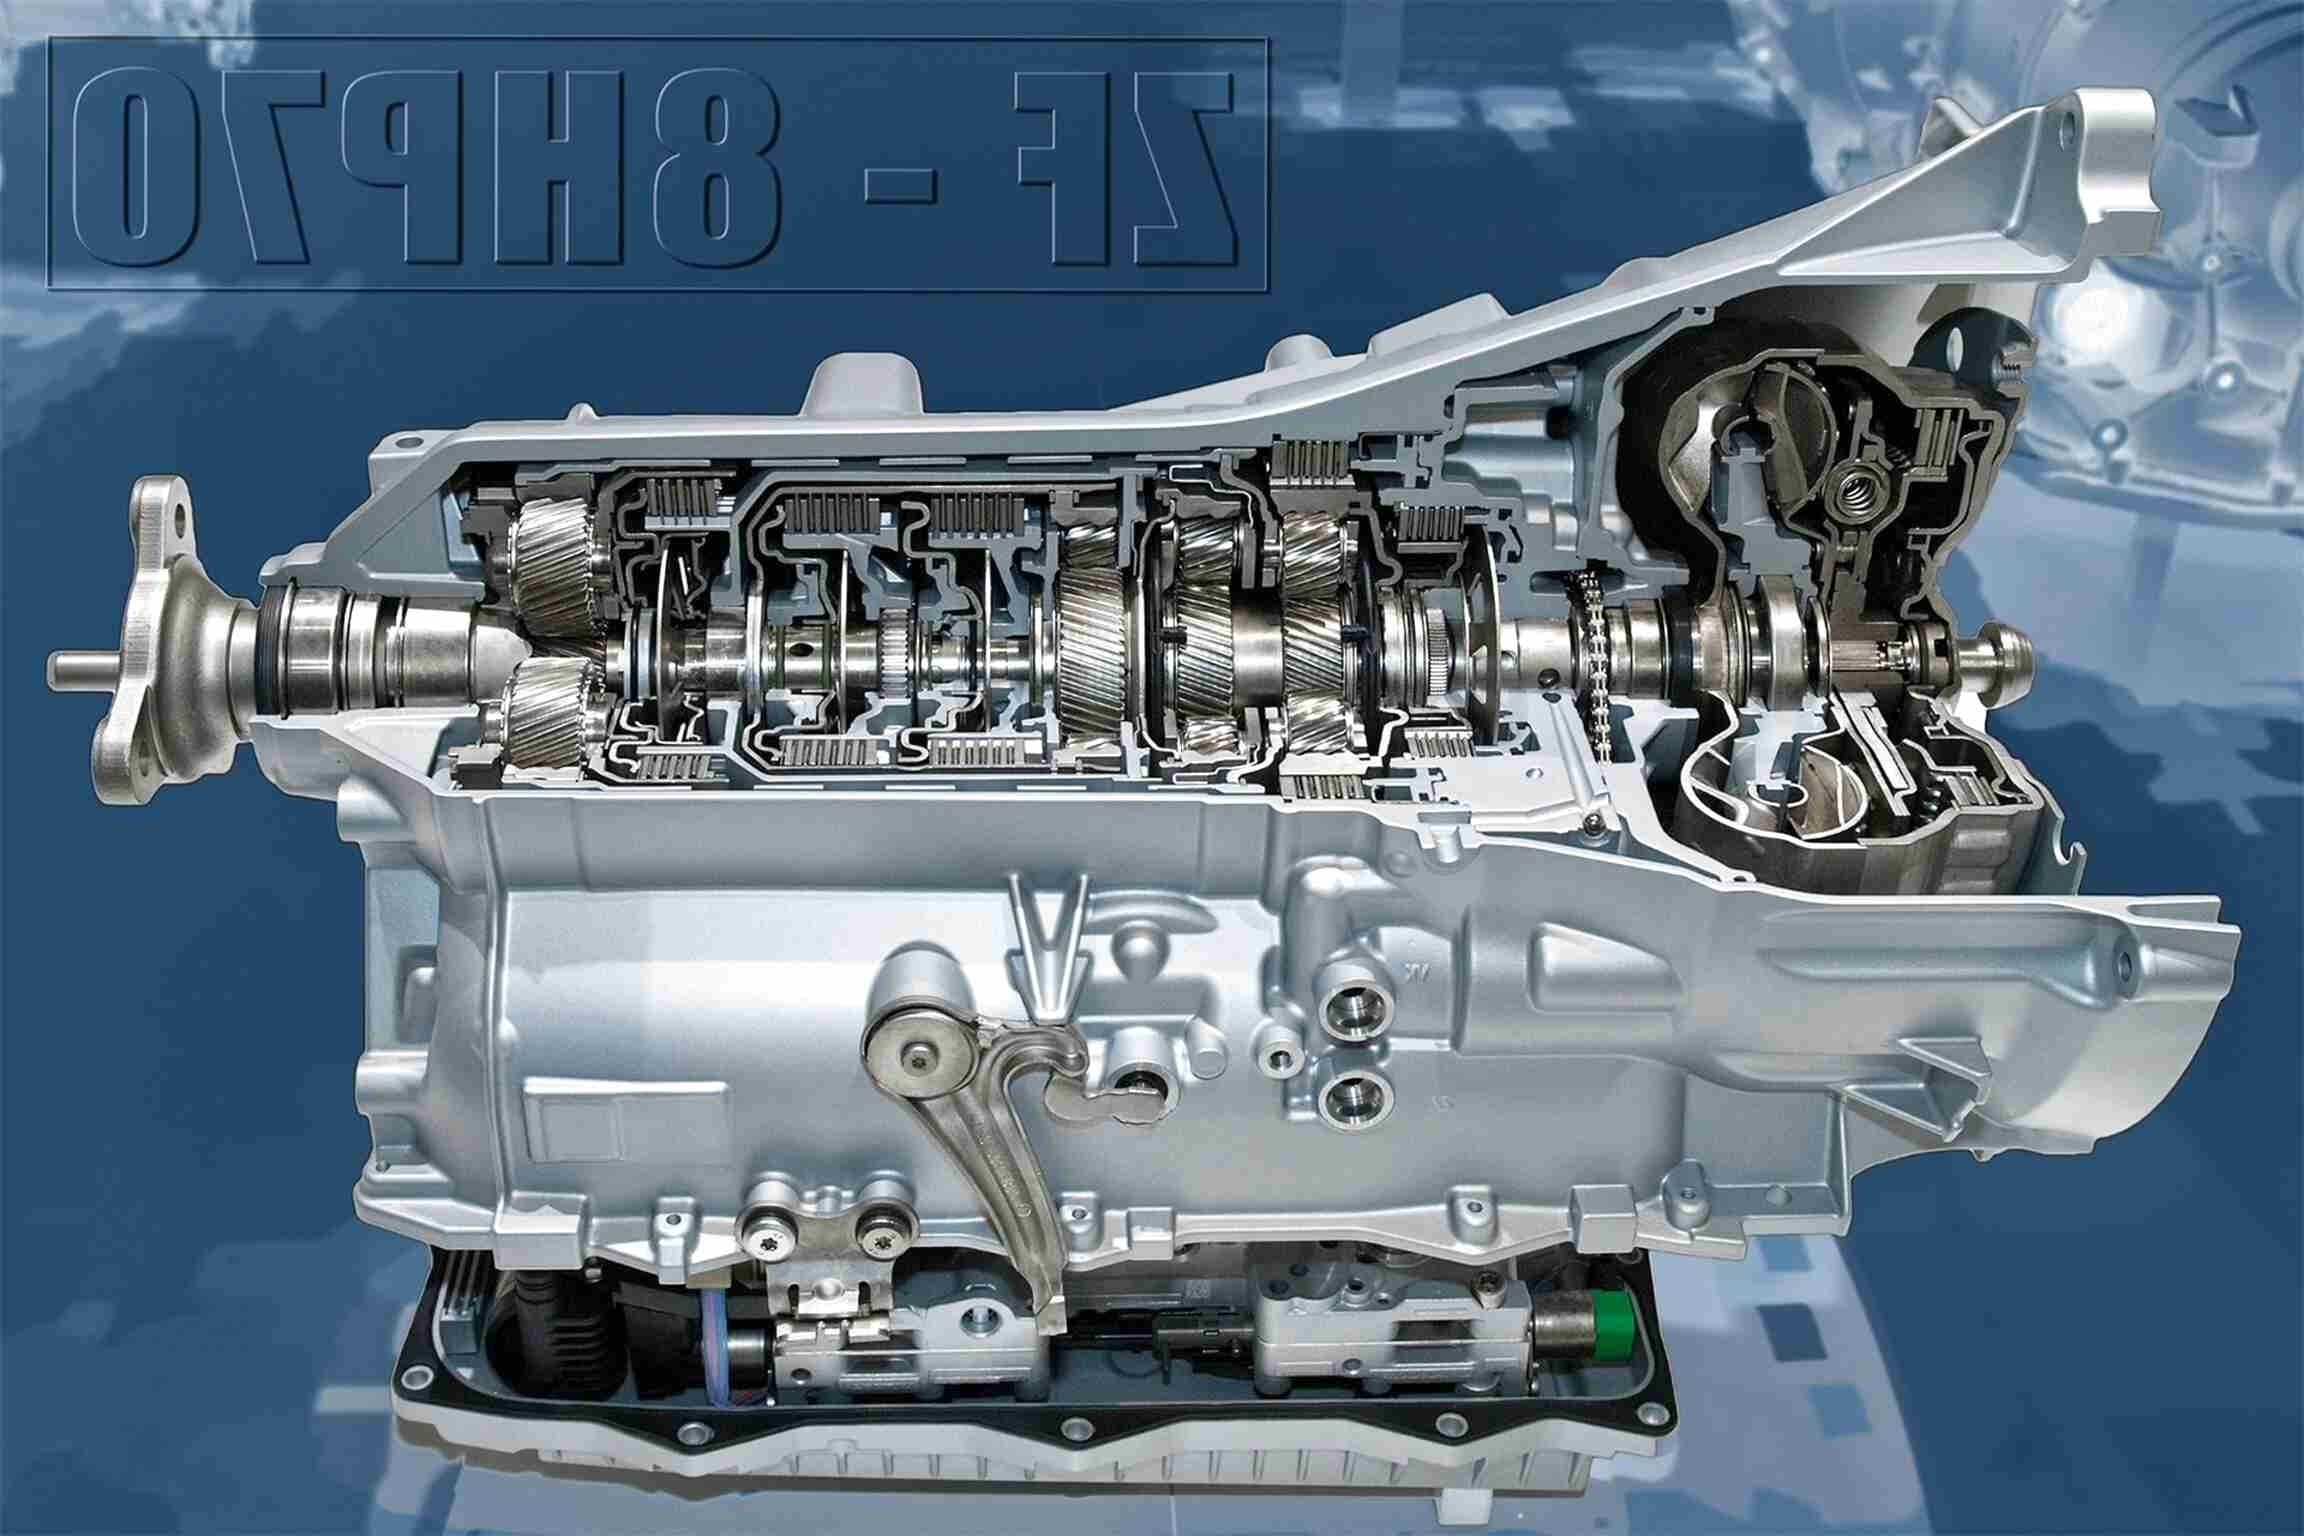 zf transmission for sale